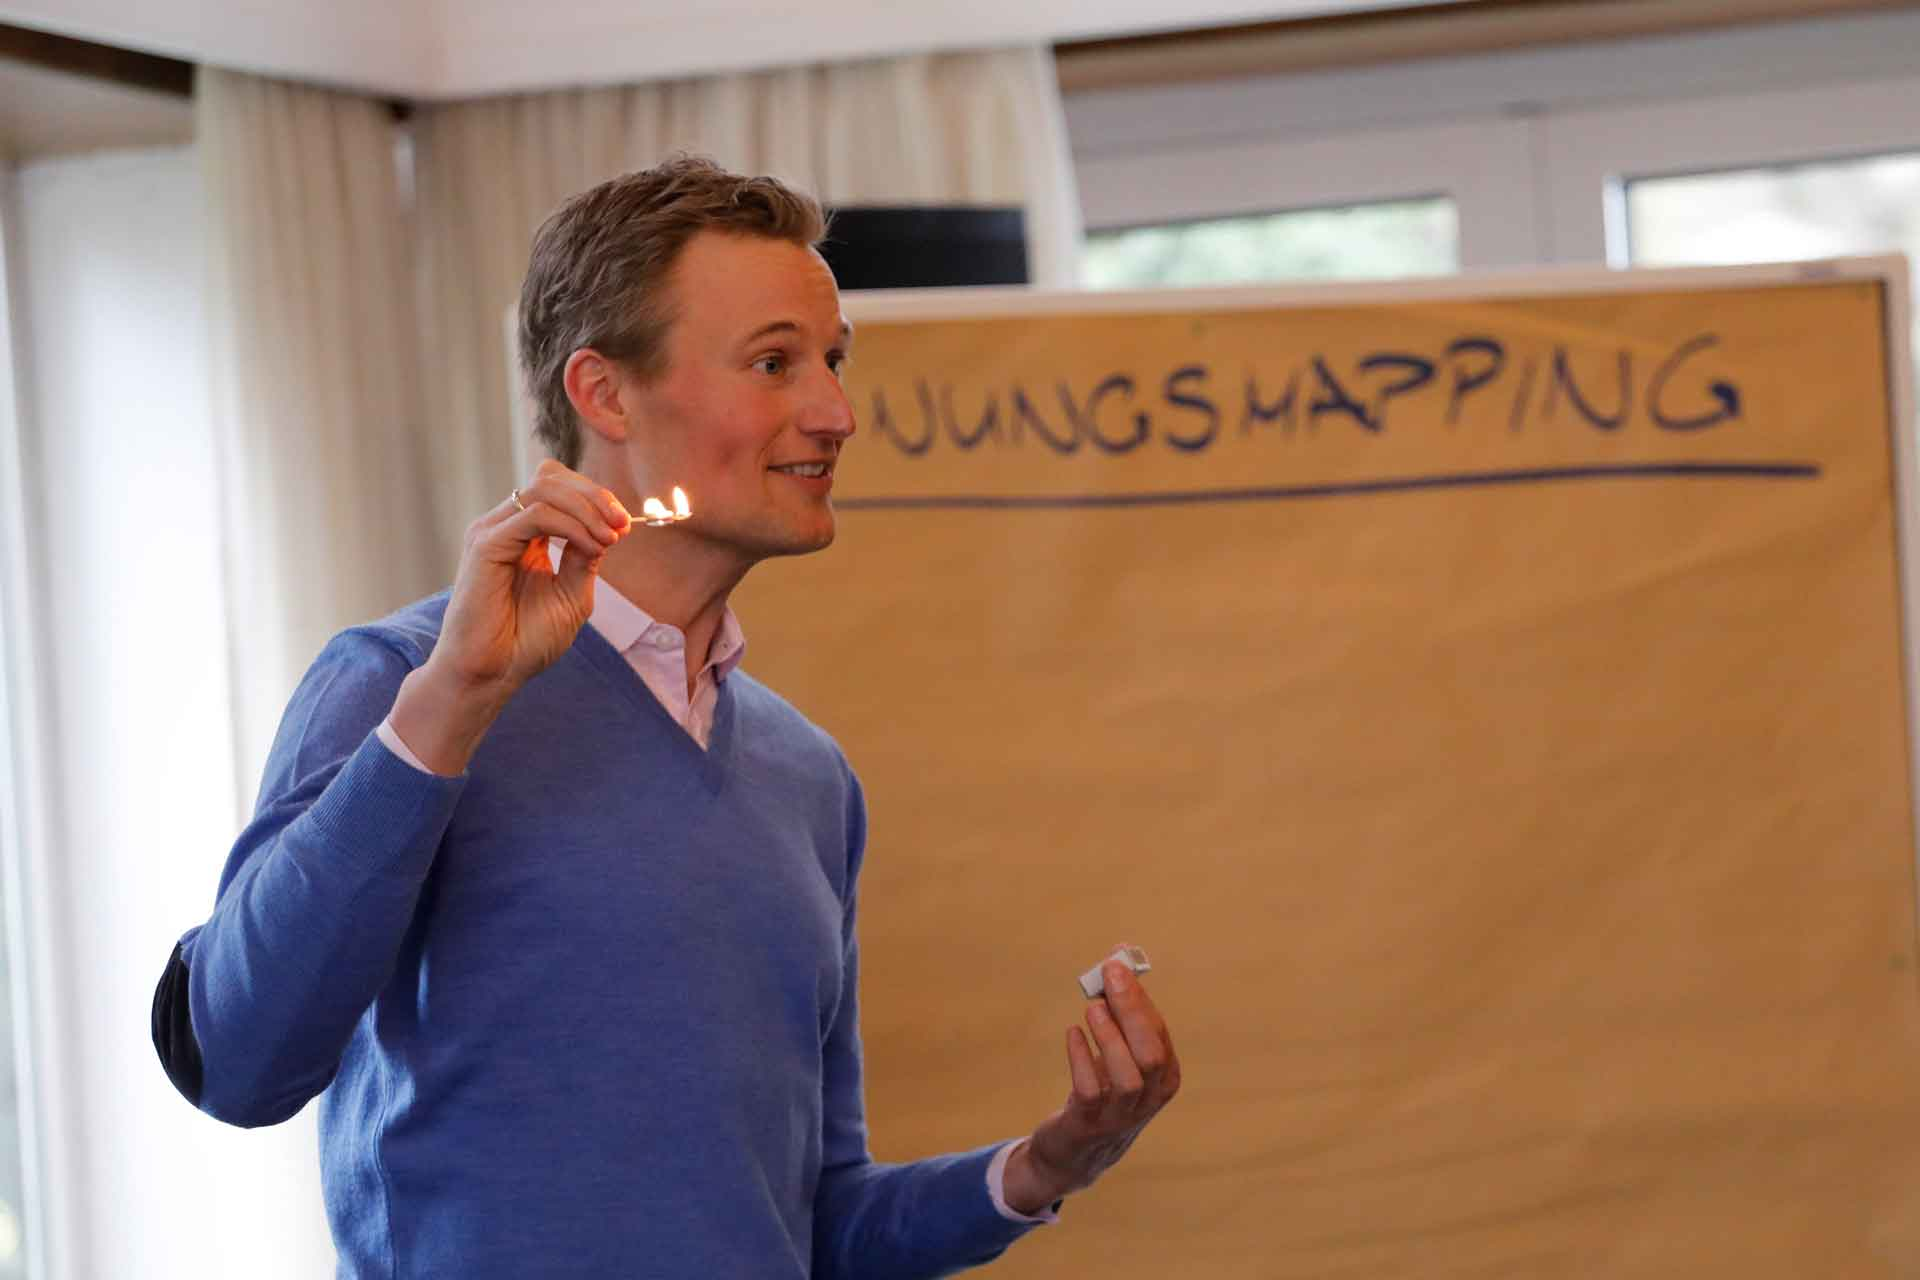 Zündholz - Idee - Innovationssprint Simon Schnetzer - GSA Winterkonferenz 2019